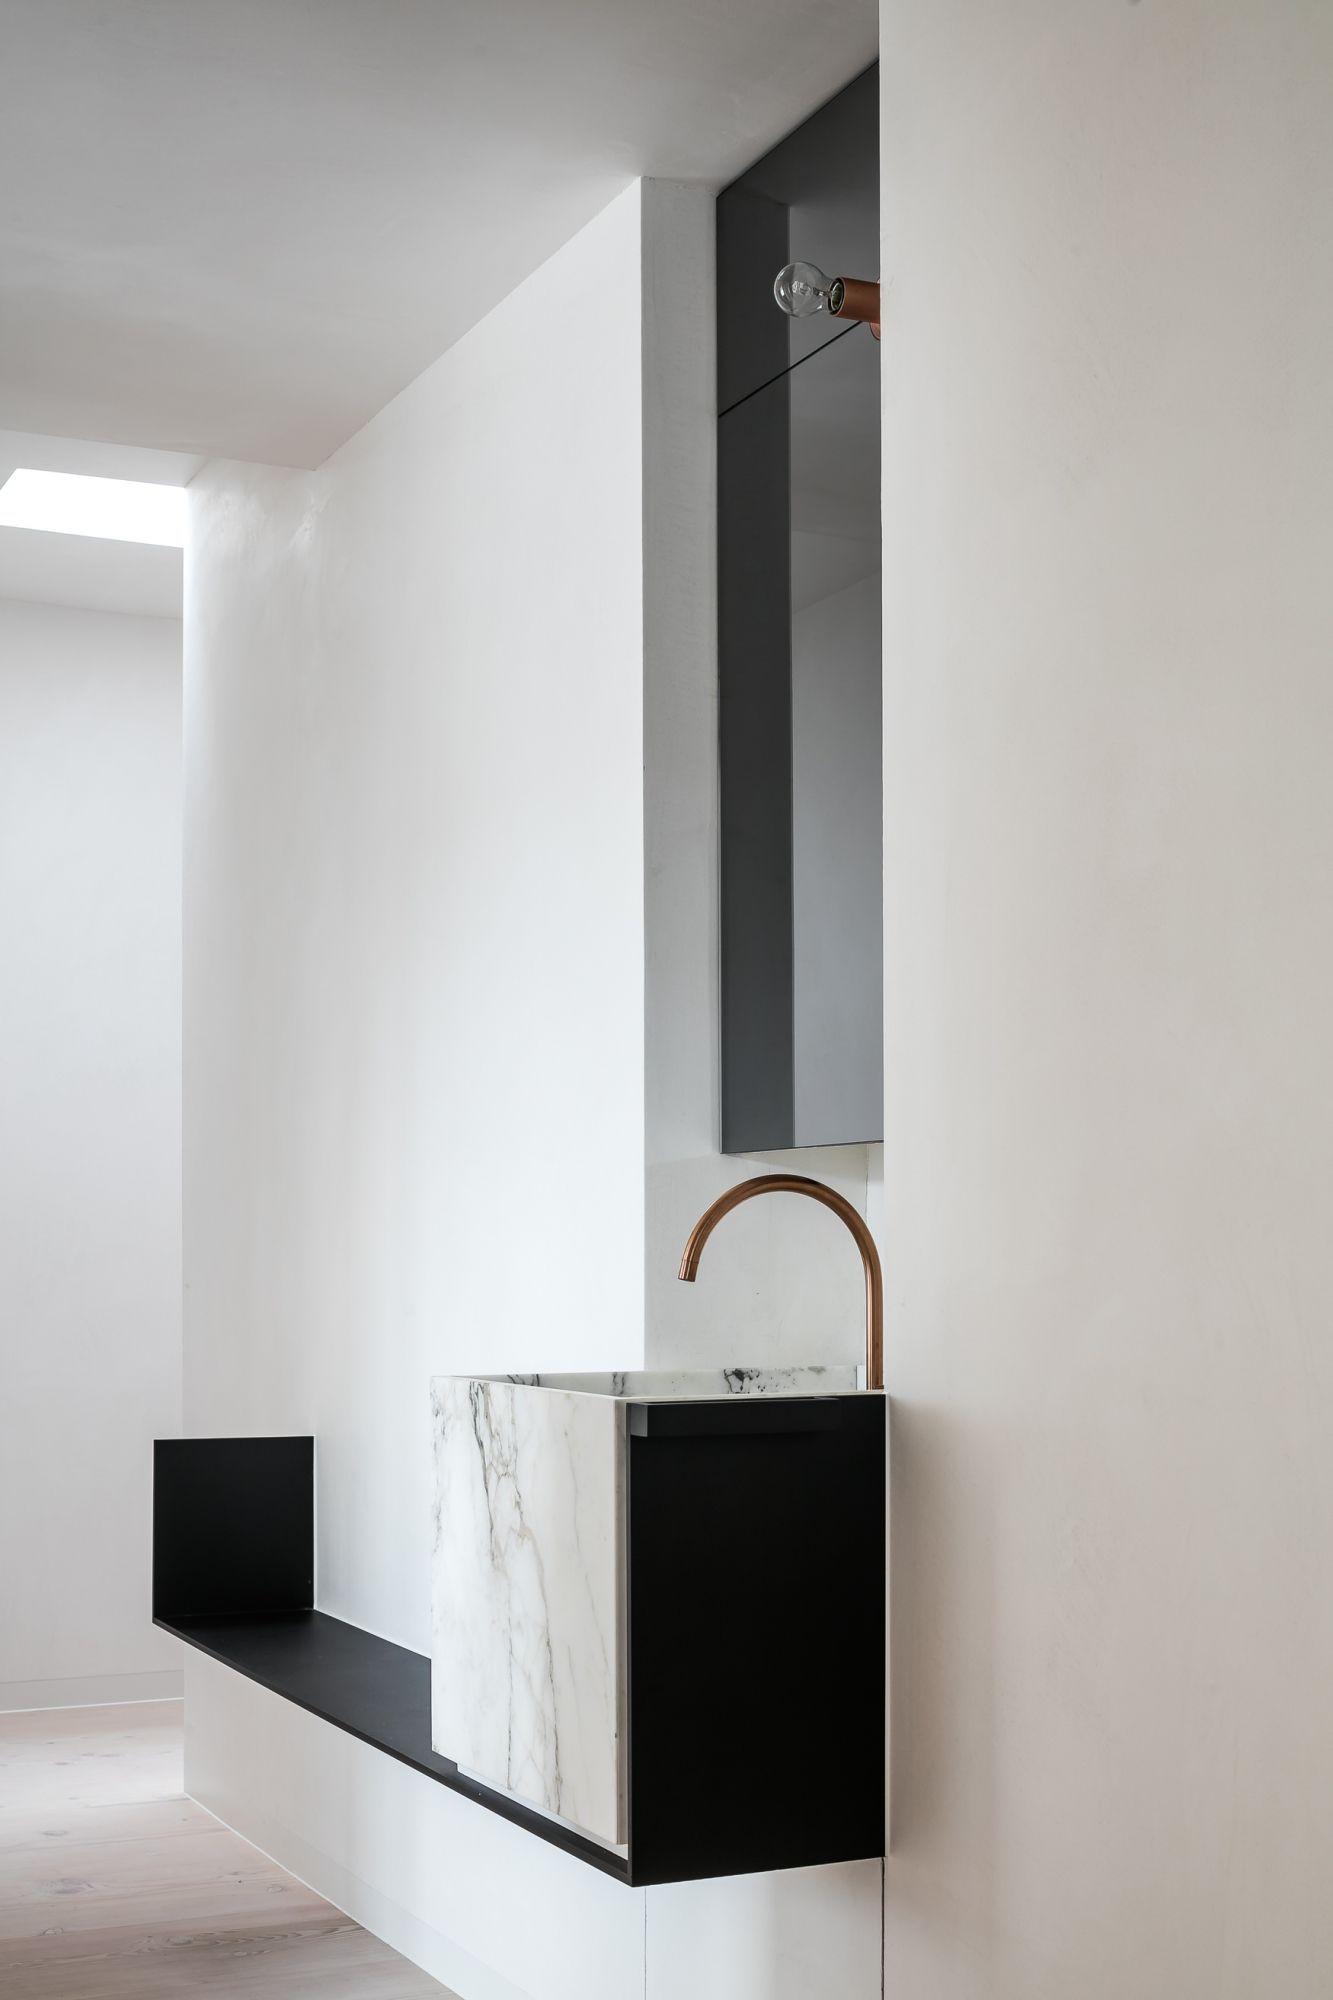 DB Gent #bathroomsinks   Public Bathroom design   Pinterest   Toilet ...